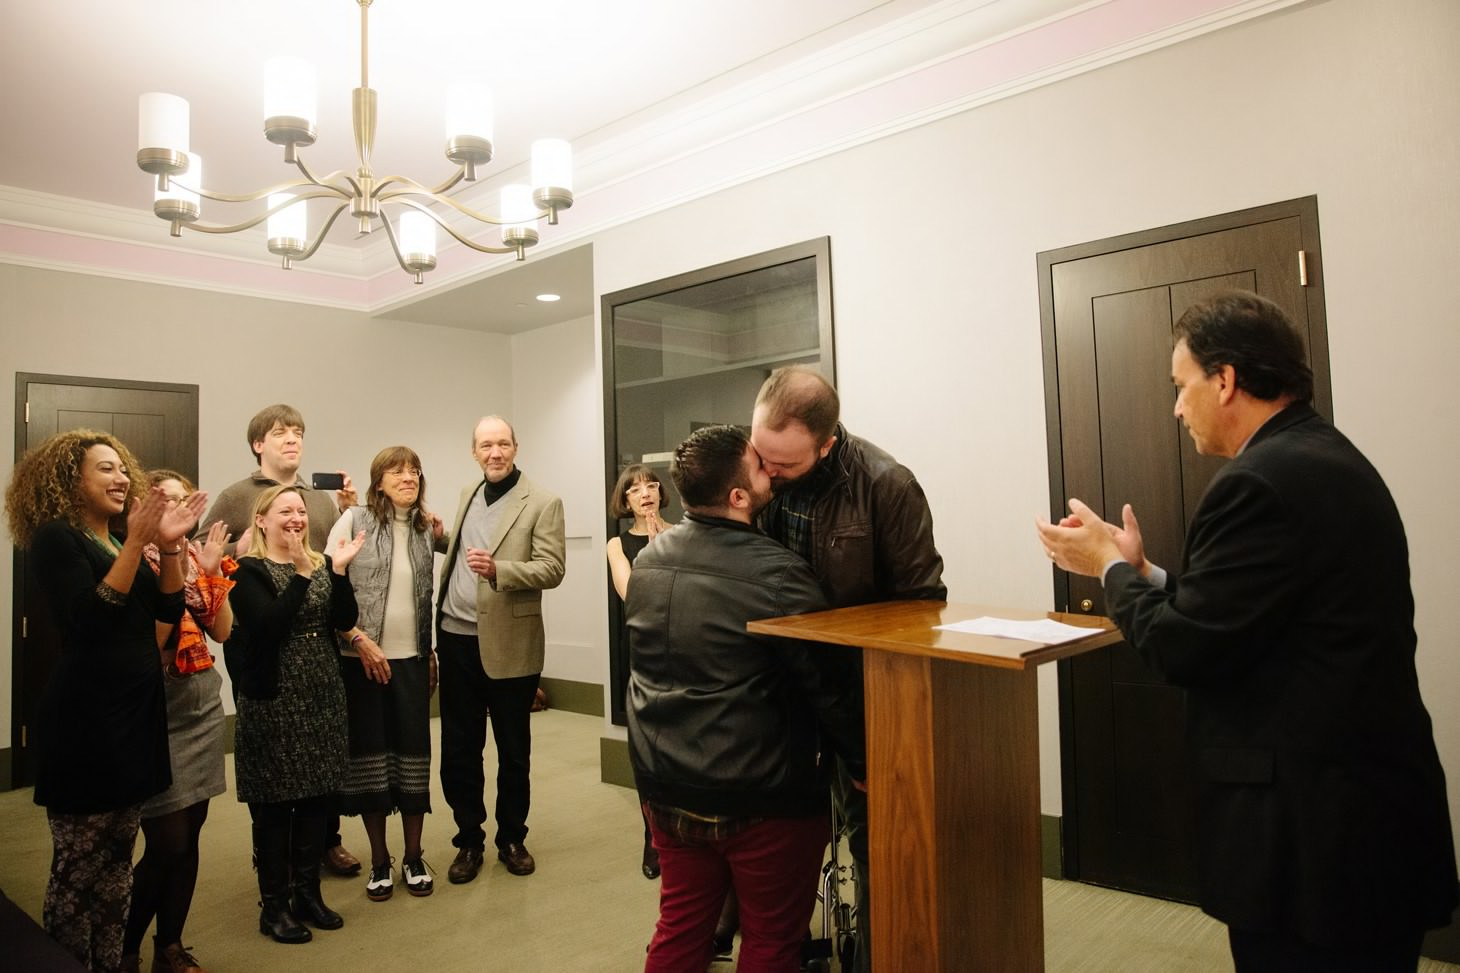 029-nyc-wedding-elopement-lgbt-friendly-photographer-city-hall-kareoke.jpg